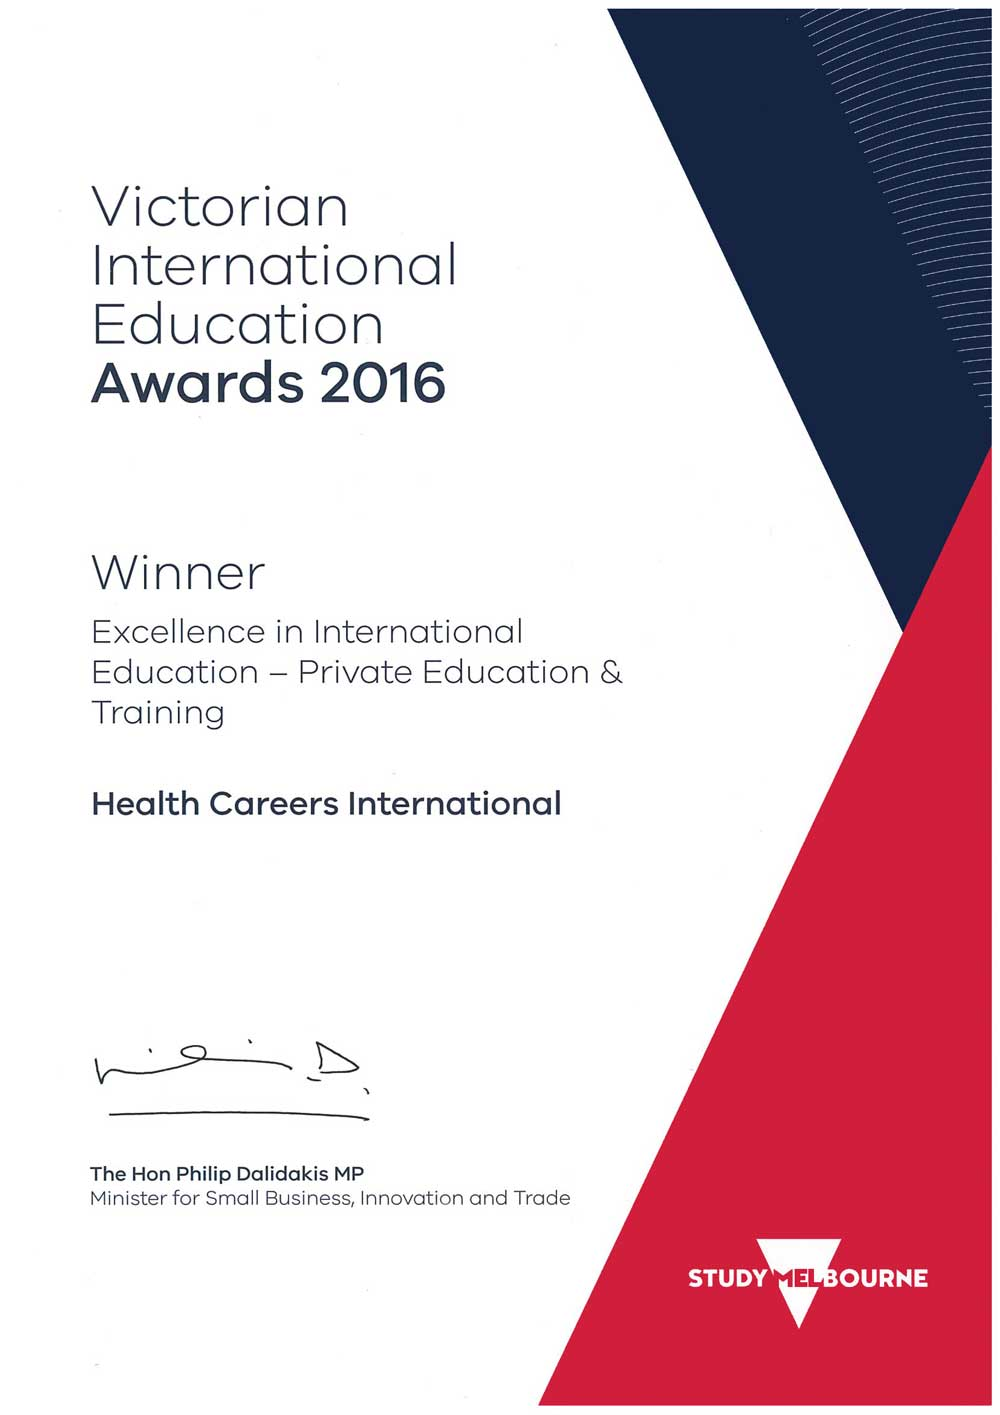 Victorian International Education Award